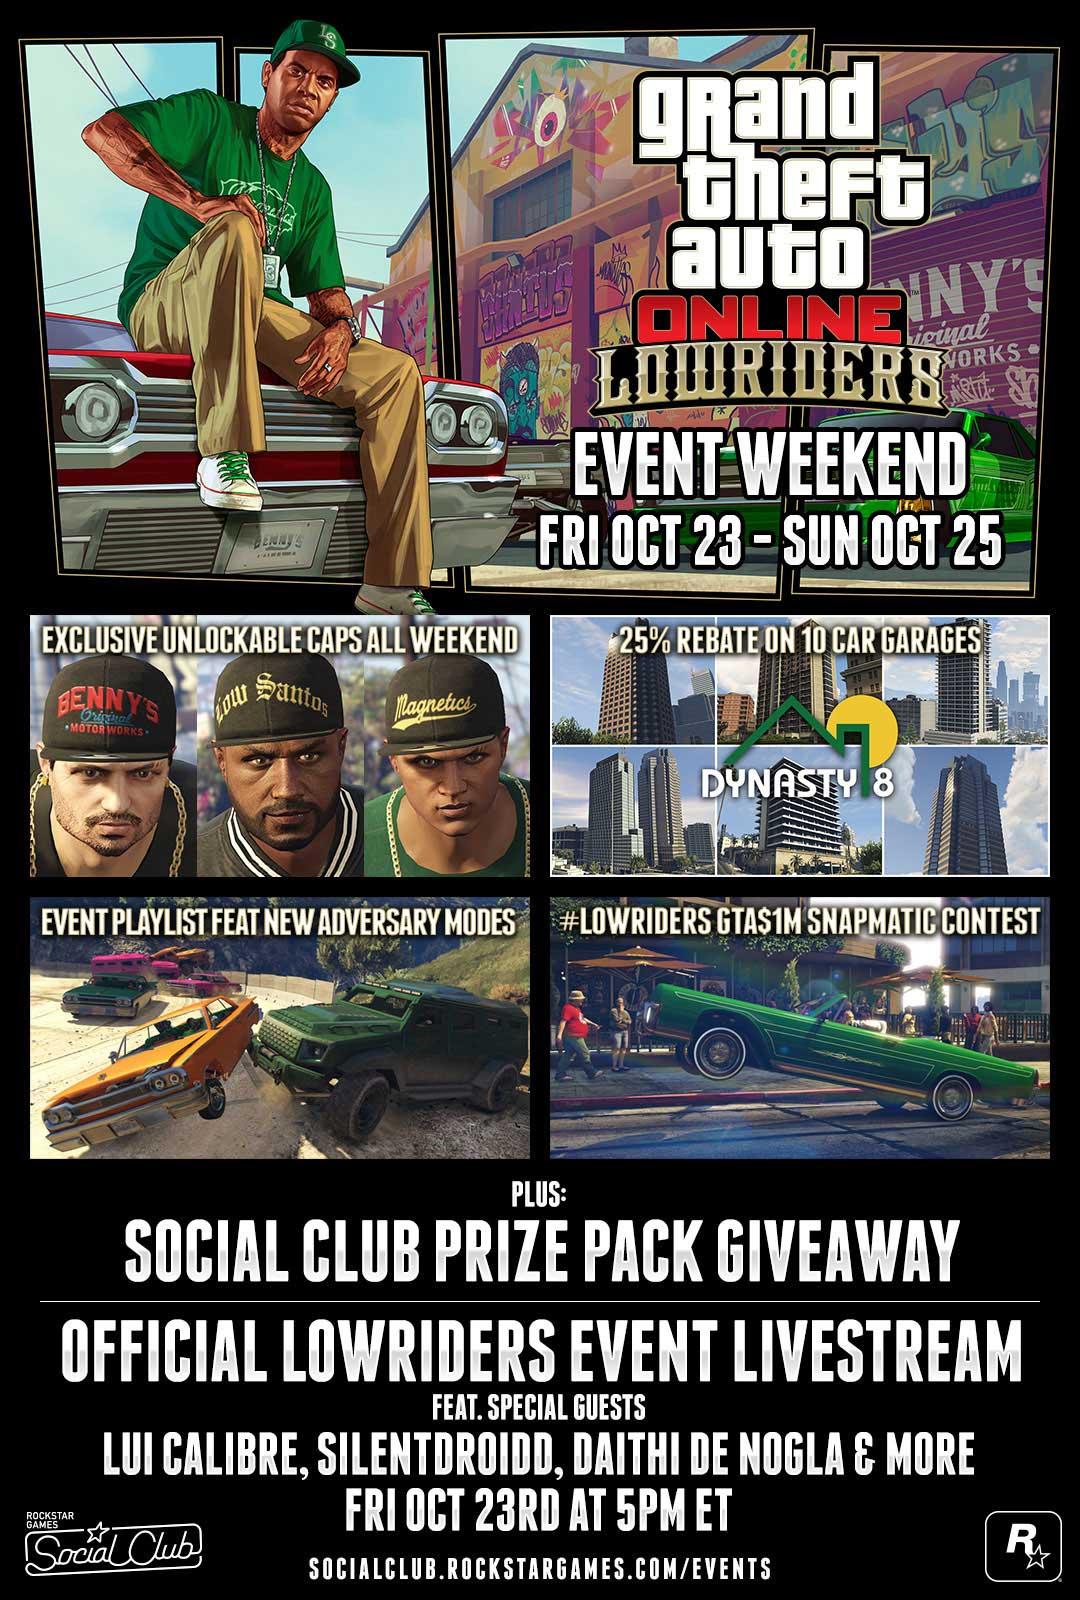 GTA Online - wydarzenie weekendowe